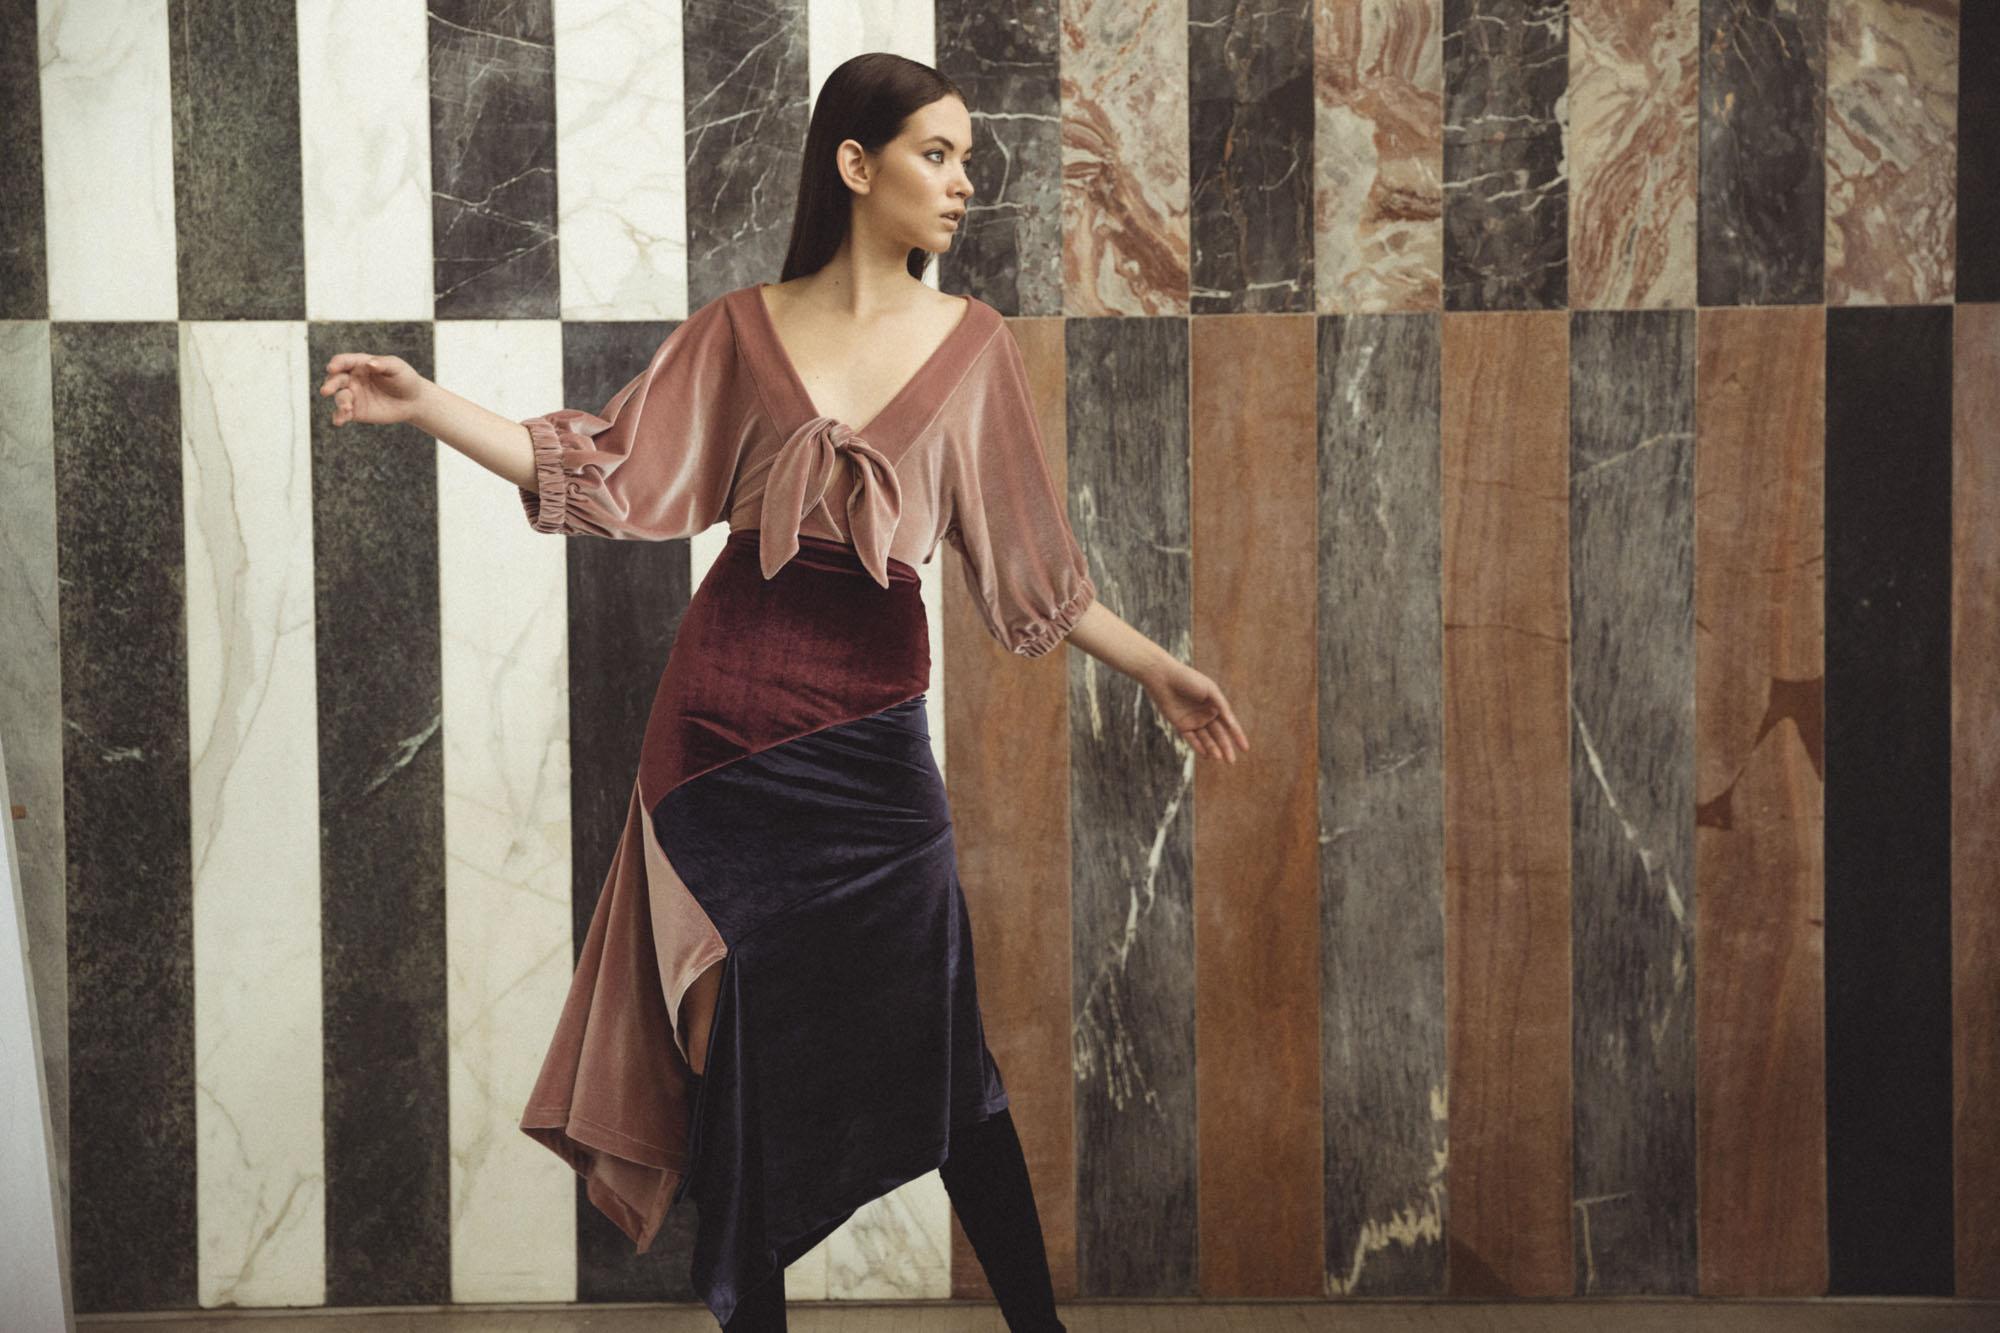 efrain_mogollon_femineus_america_ dress3.JPG